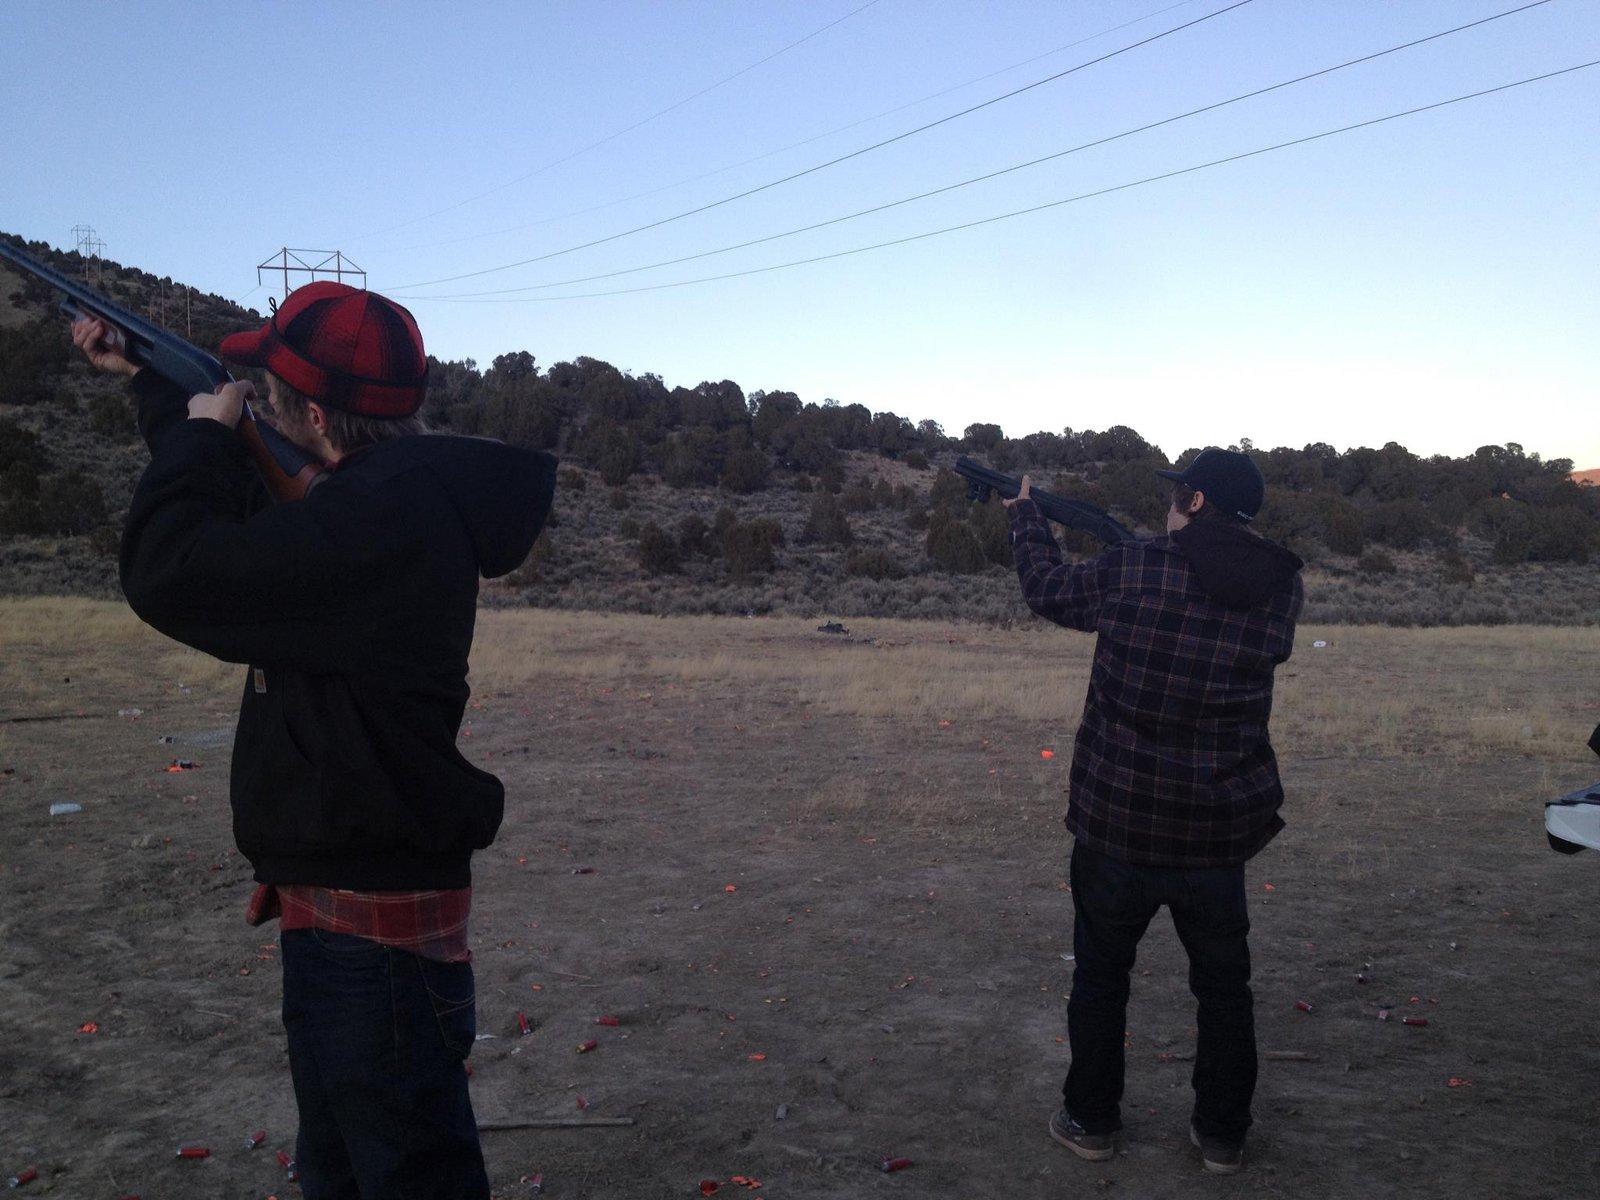 Shooting shit